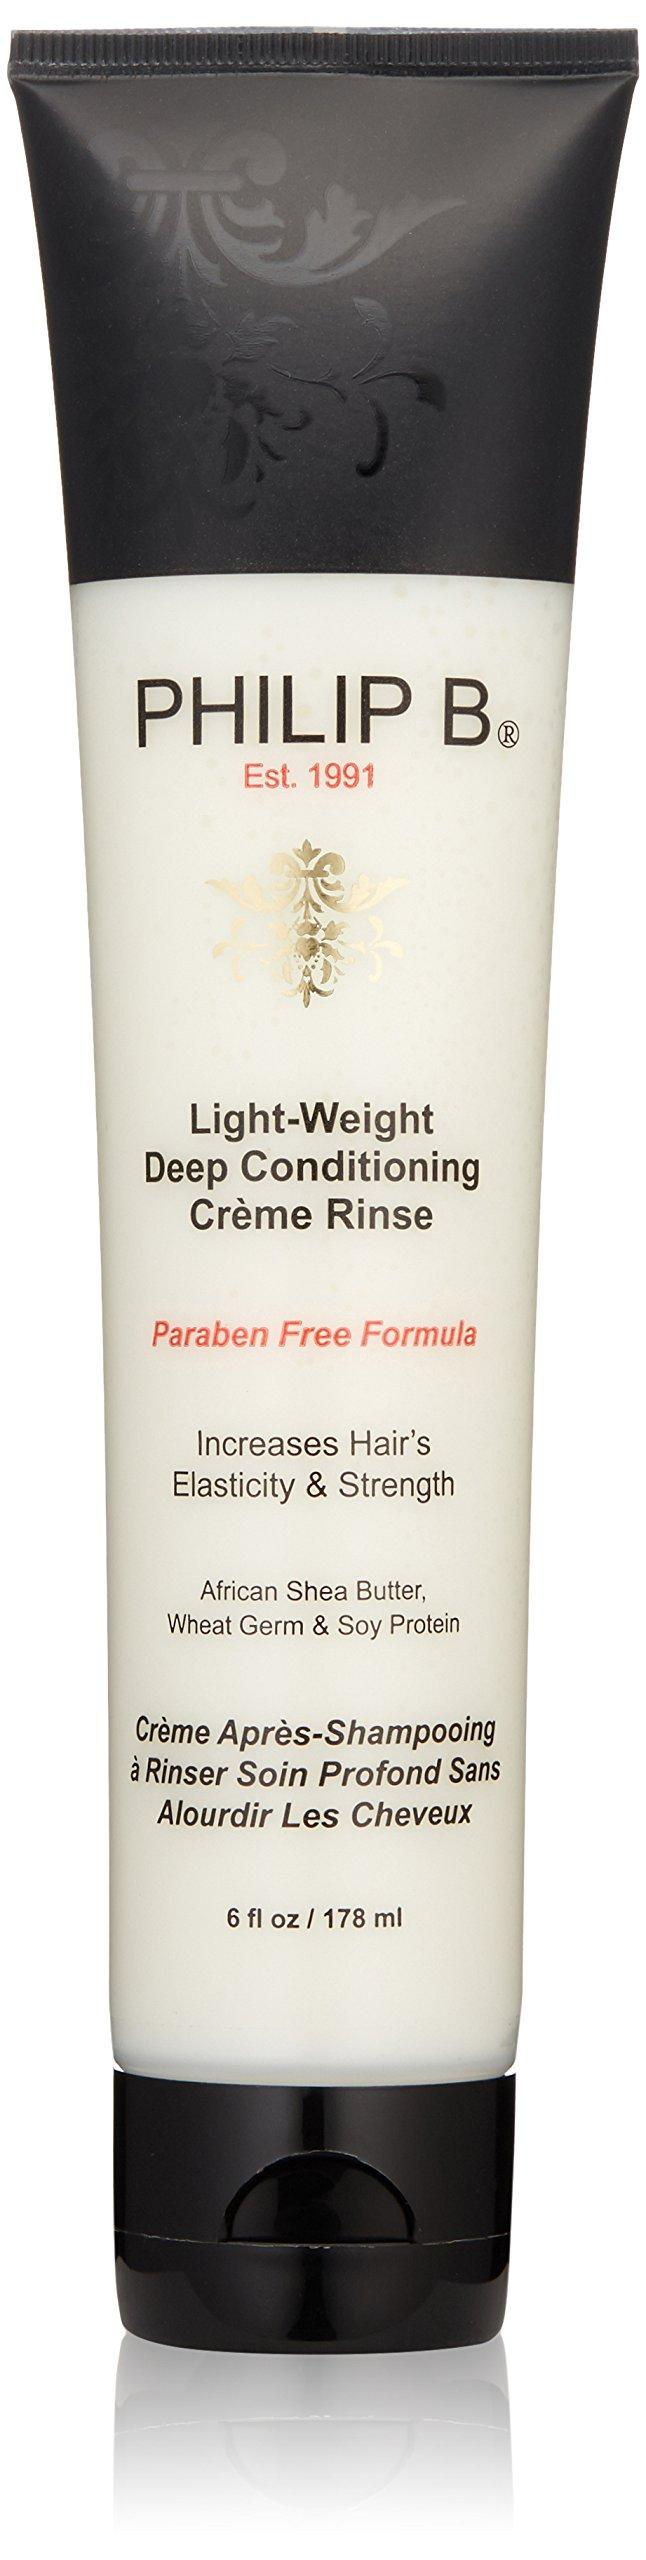 PHILIP B Light-Weight Deep Conditioning Cream Rinse Conditioner, Paraben Free Formula, 6 fl. oz.